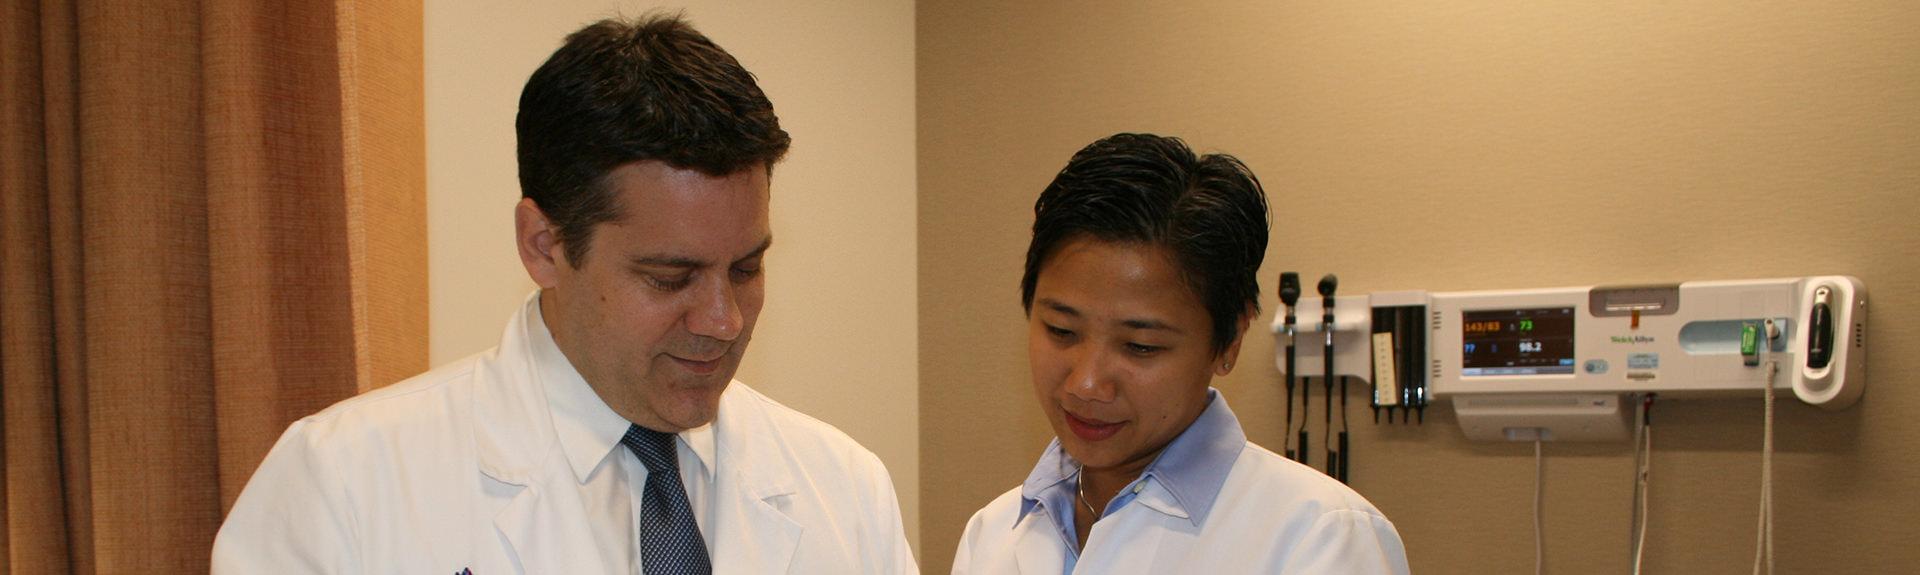 The Lauder Family Cardiovascular Center | Mount Sinai - New York